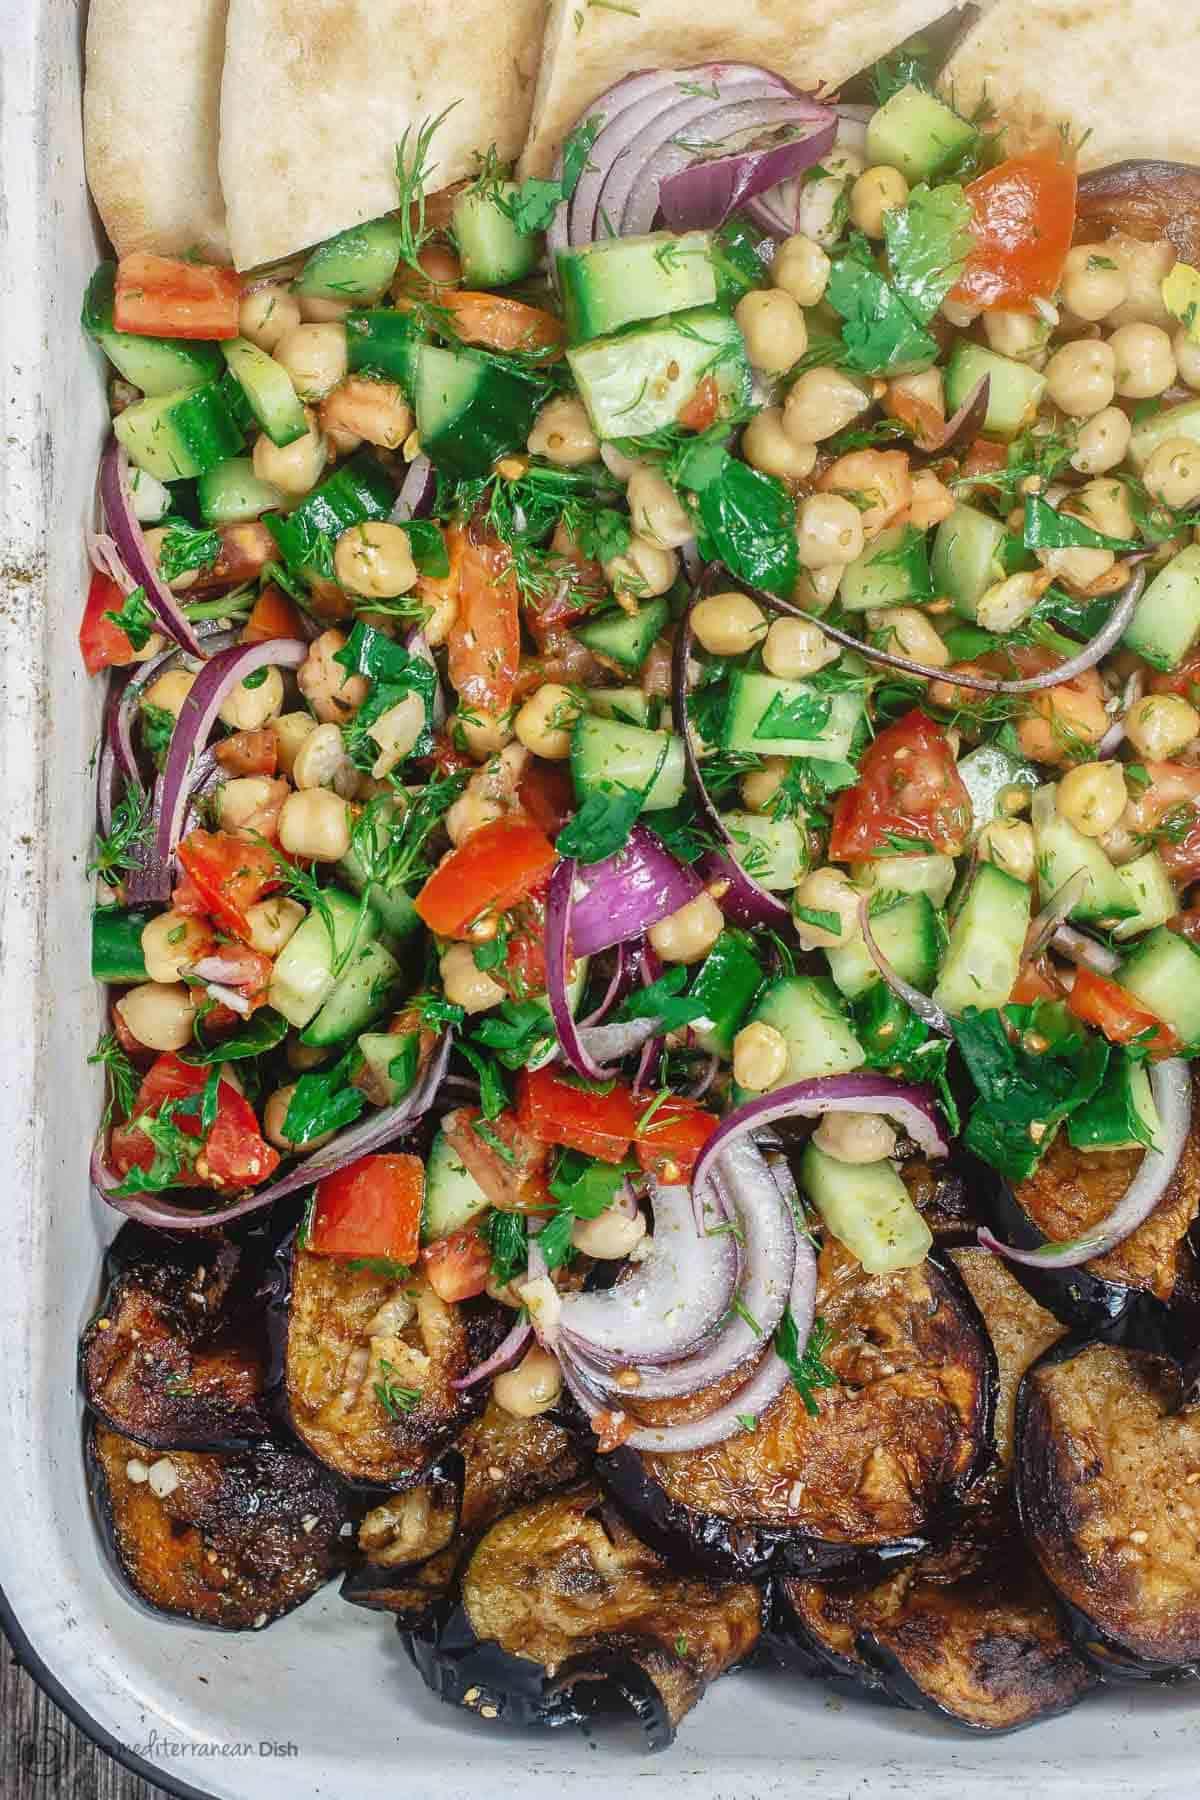 Za'atar Chickpea Salad with Fried Eggplant